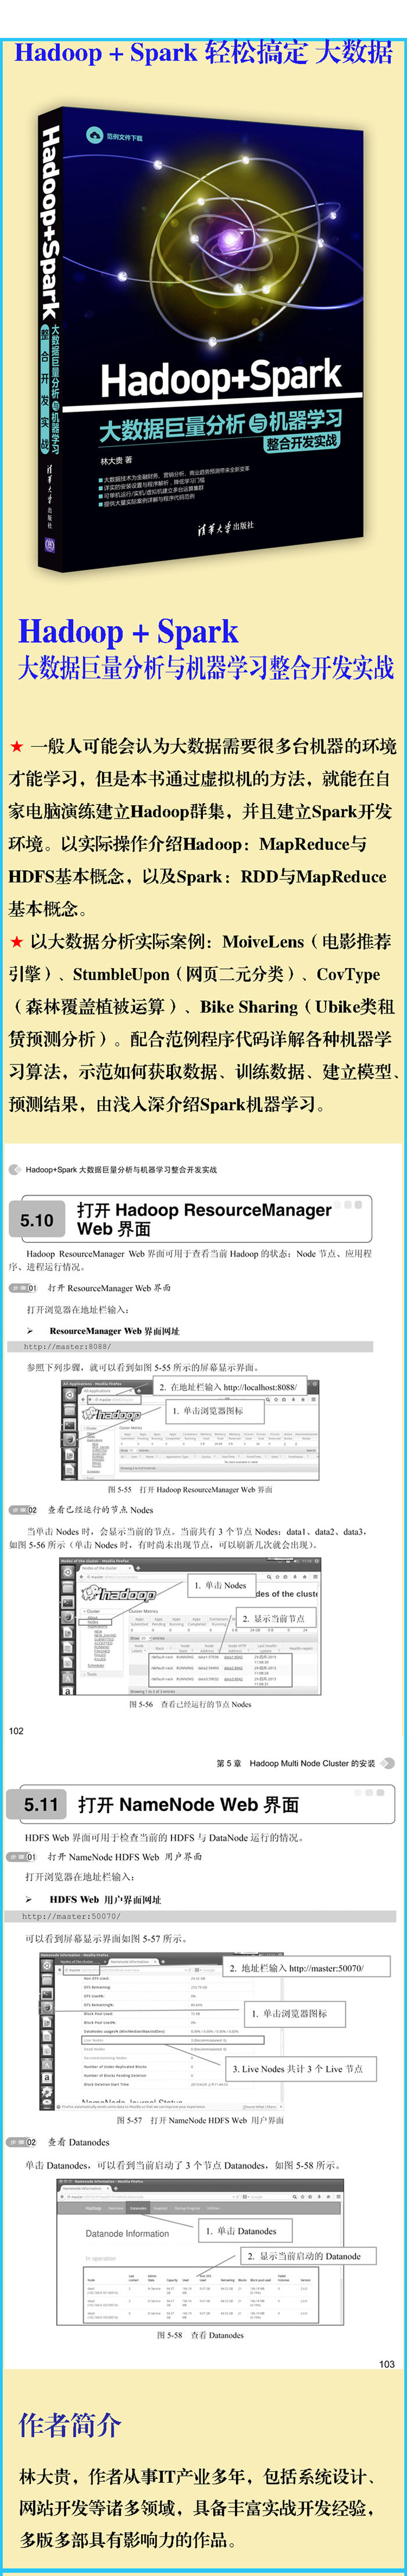 Hadoop + Spark 大数据巨量分析与机器学习整合开发实战 PDF下载